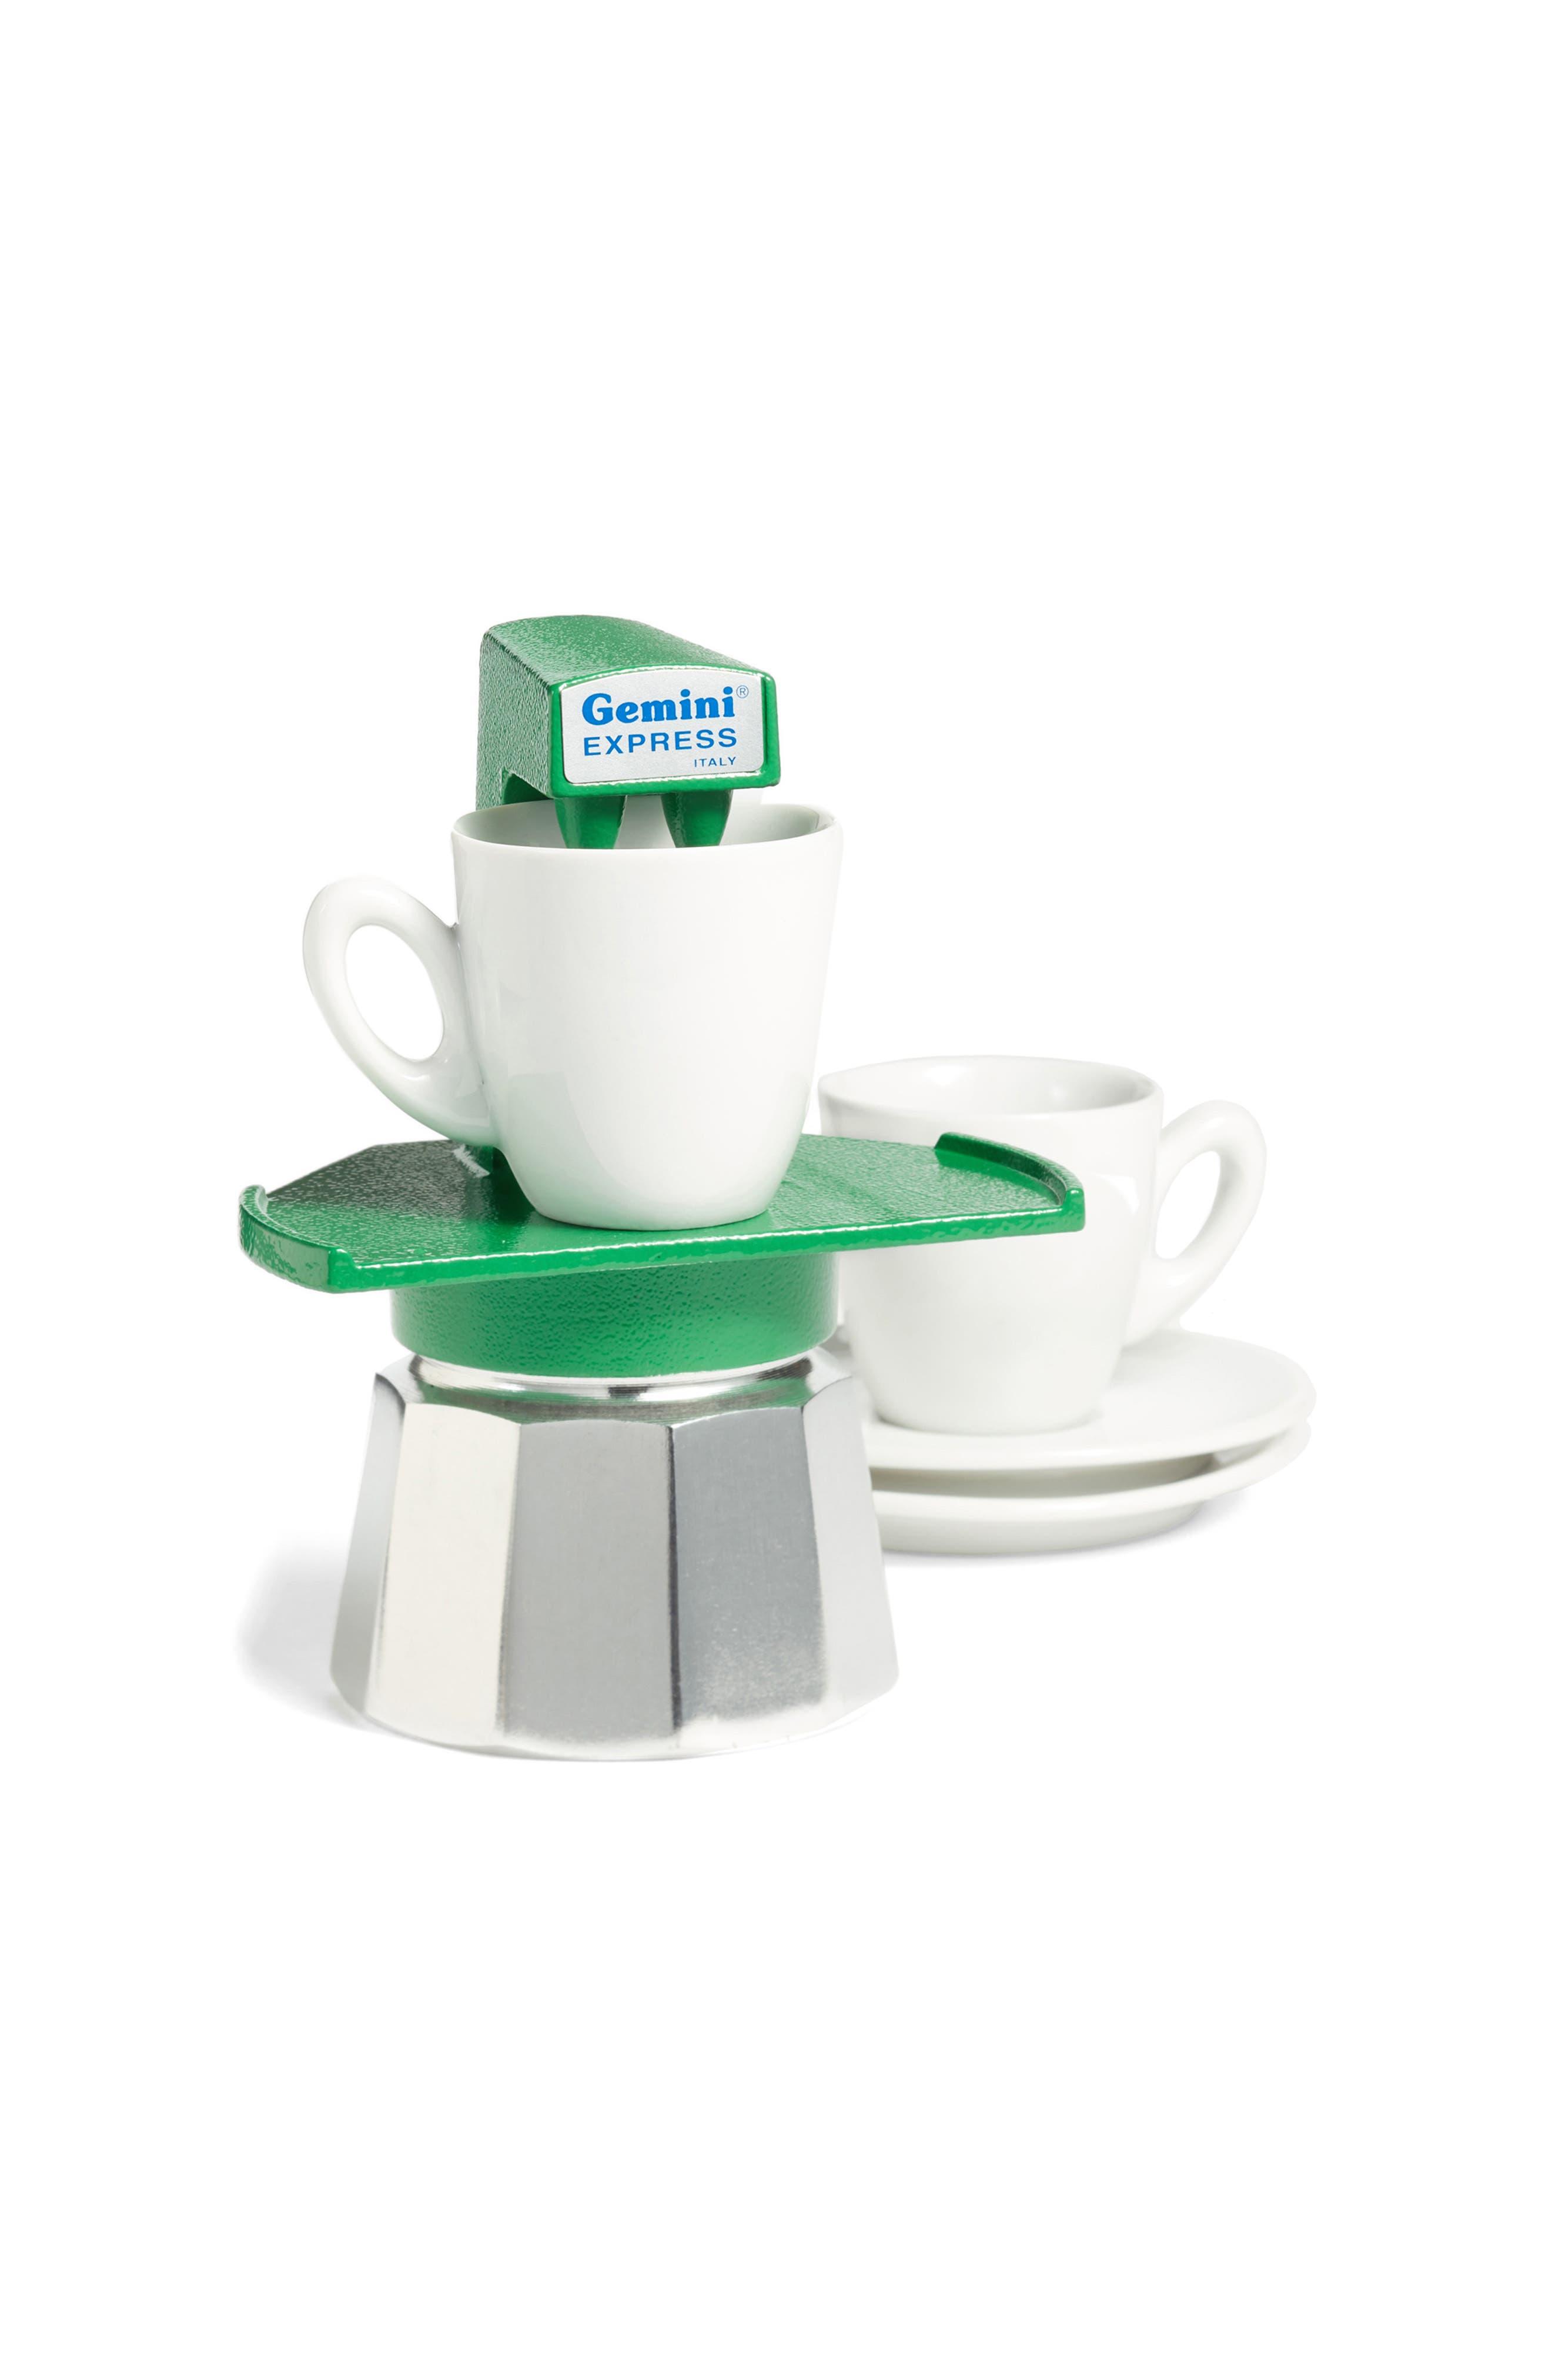 Gemini Espresso Maker,                             Alternate thumbnail 3, color,                             Green